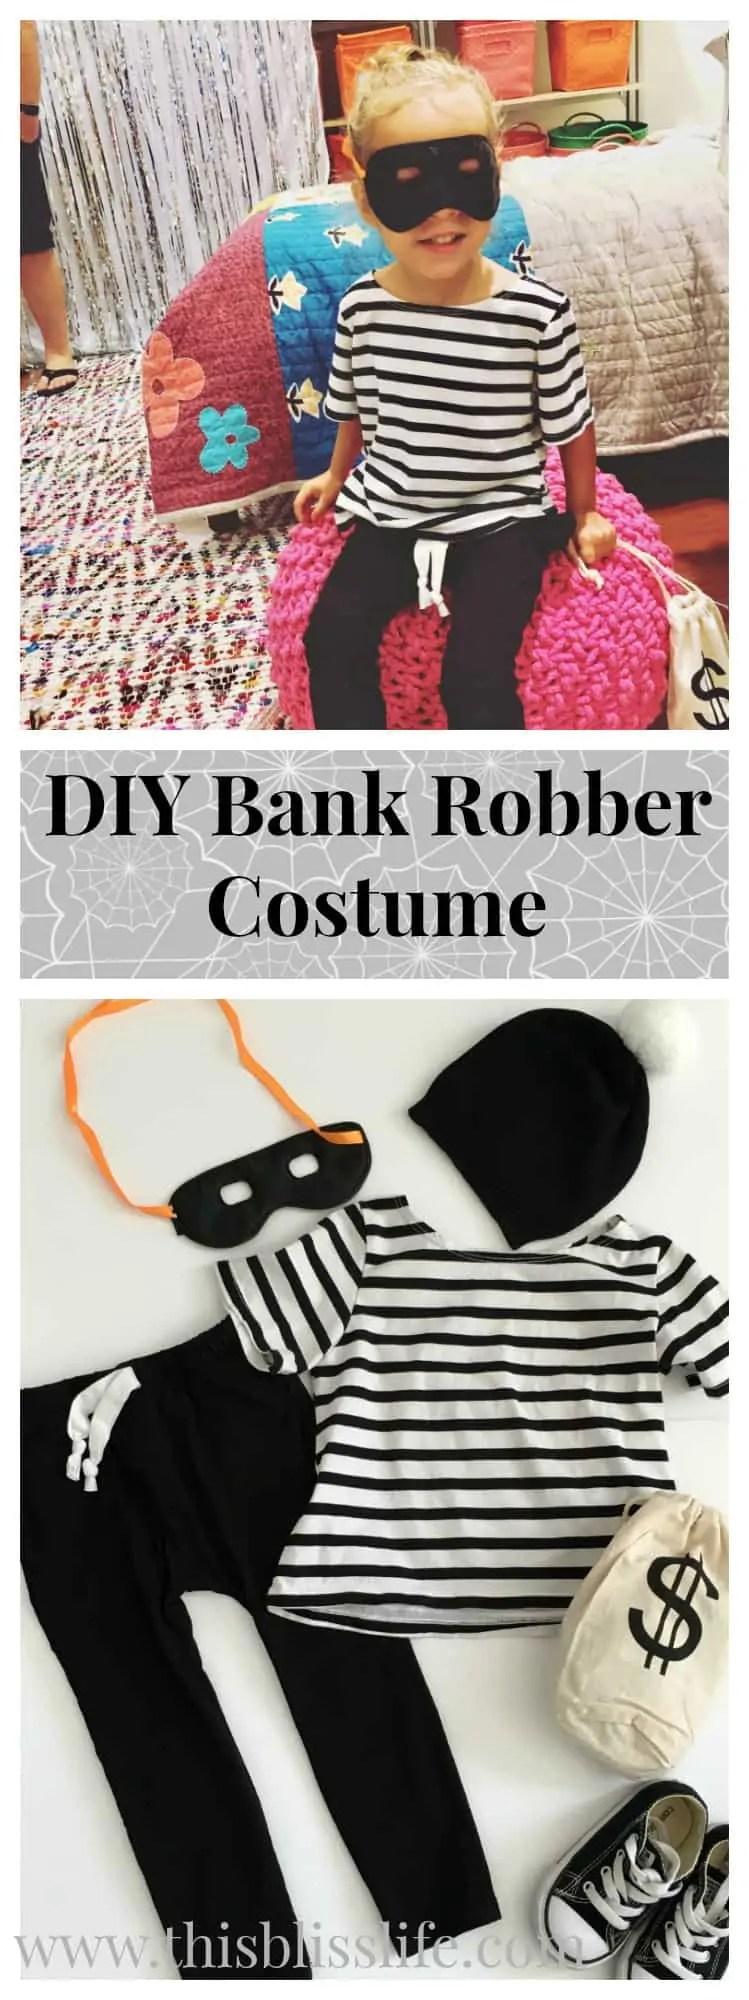 DIY Toddler Bank Robber Costume DIY Toddler Bank Robber Costume & DIY Toddler Bank Robber Costume! - This Bliss Life